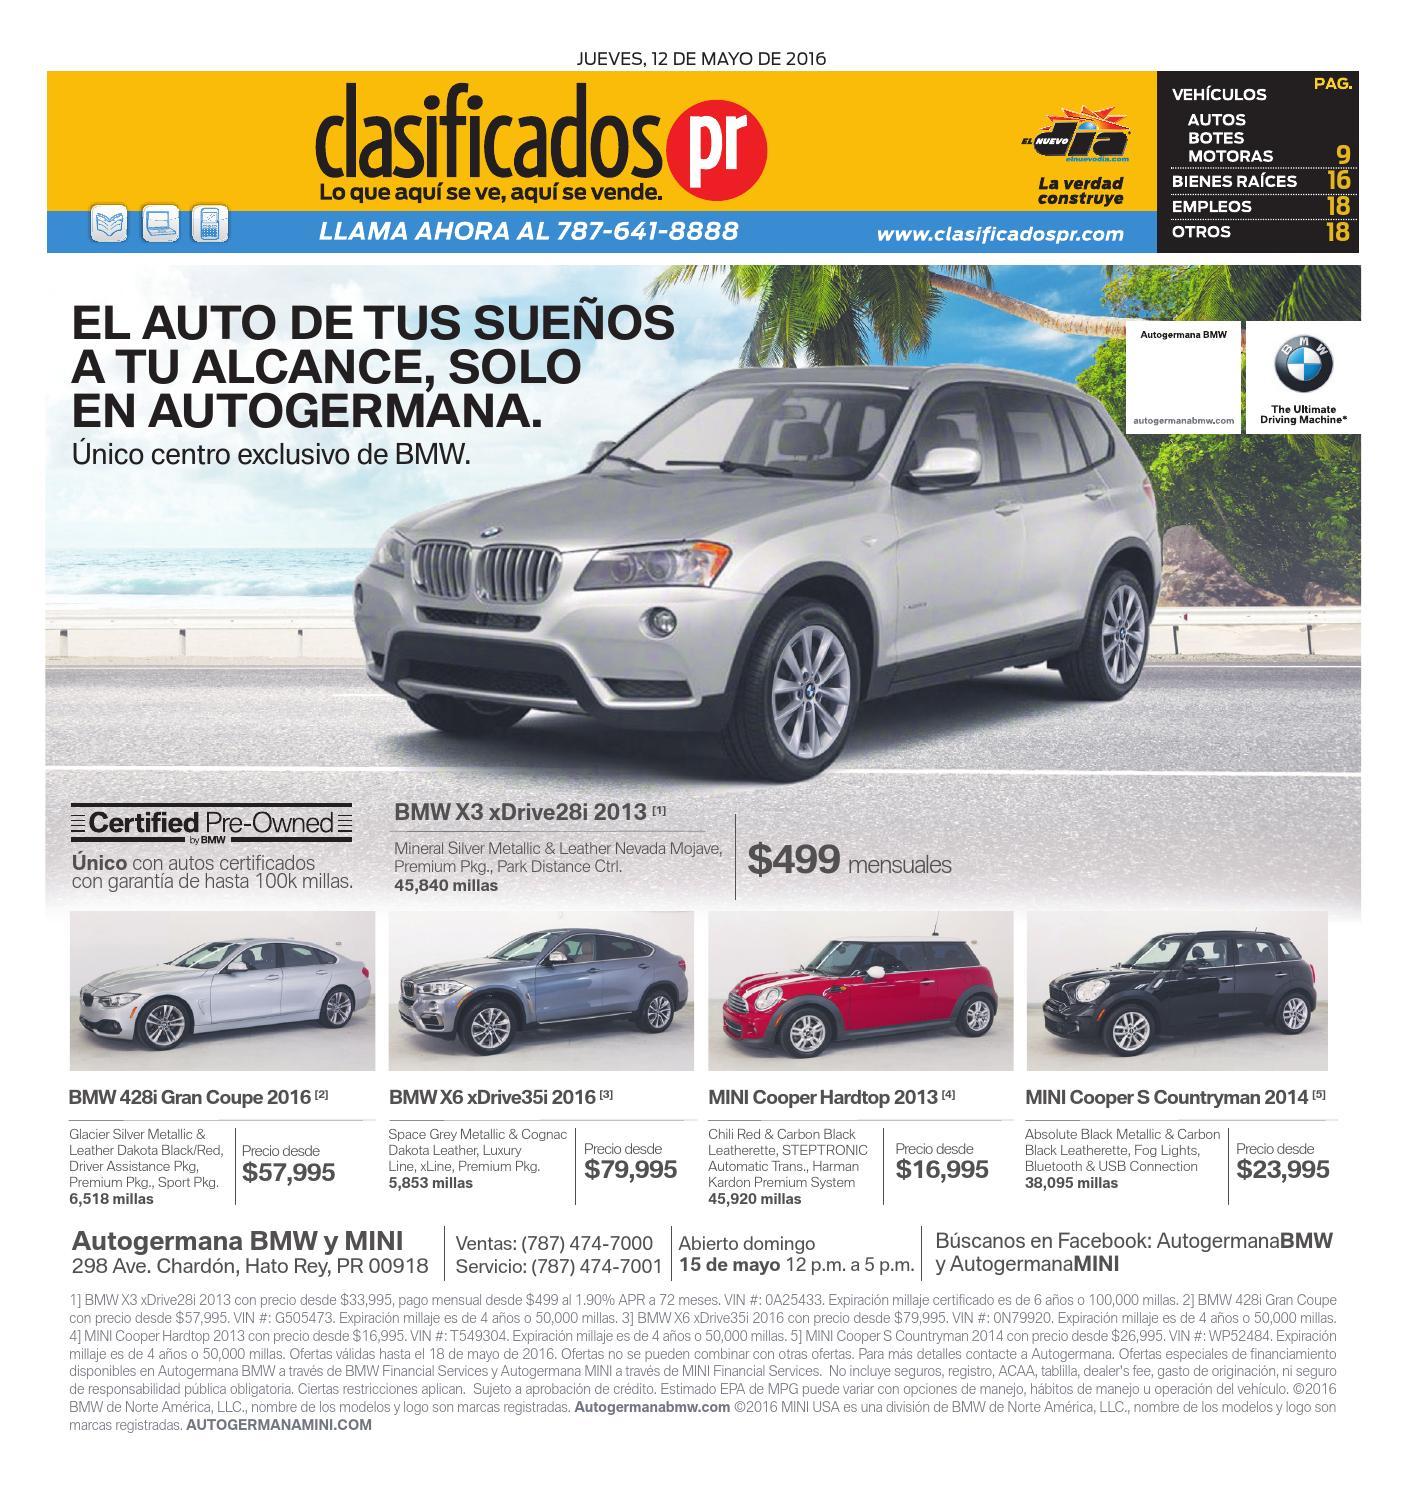 ClasificadosPR 05 12 2016 By ClasificadosPR.com